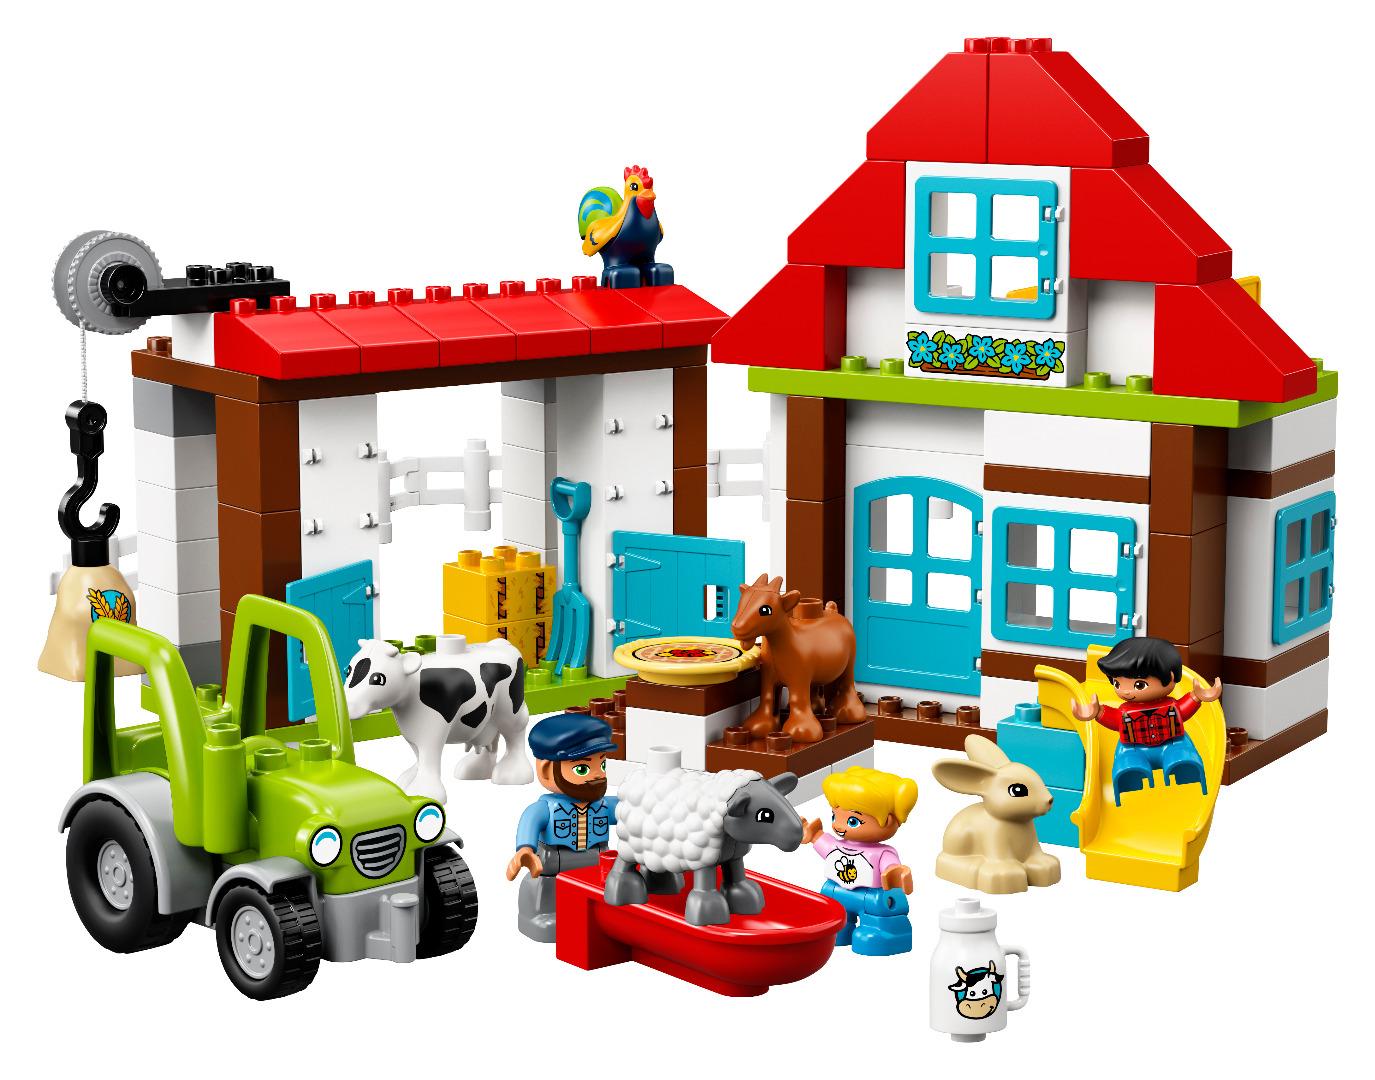 Children's designer: fun and useful